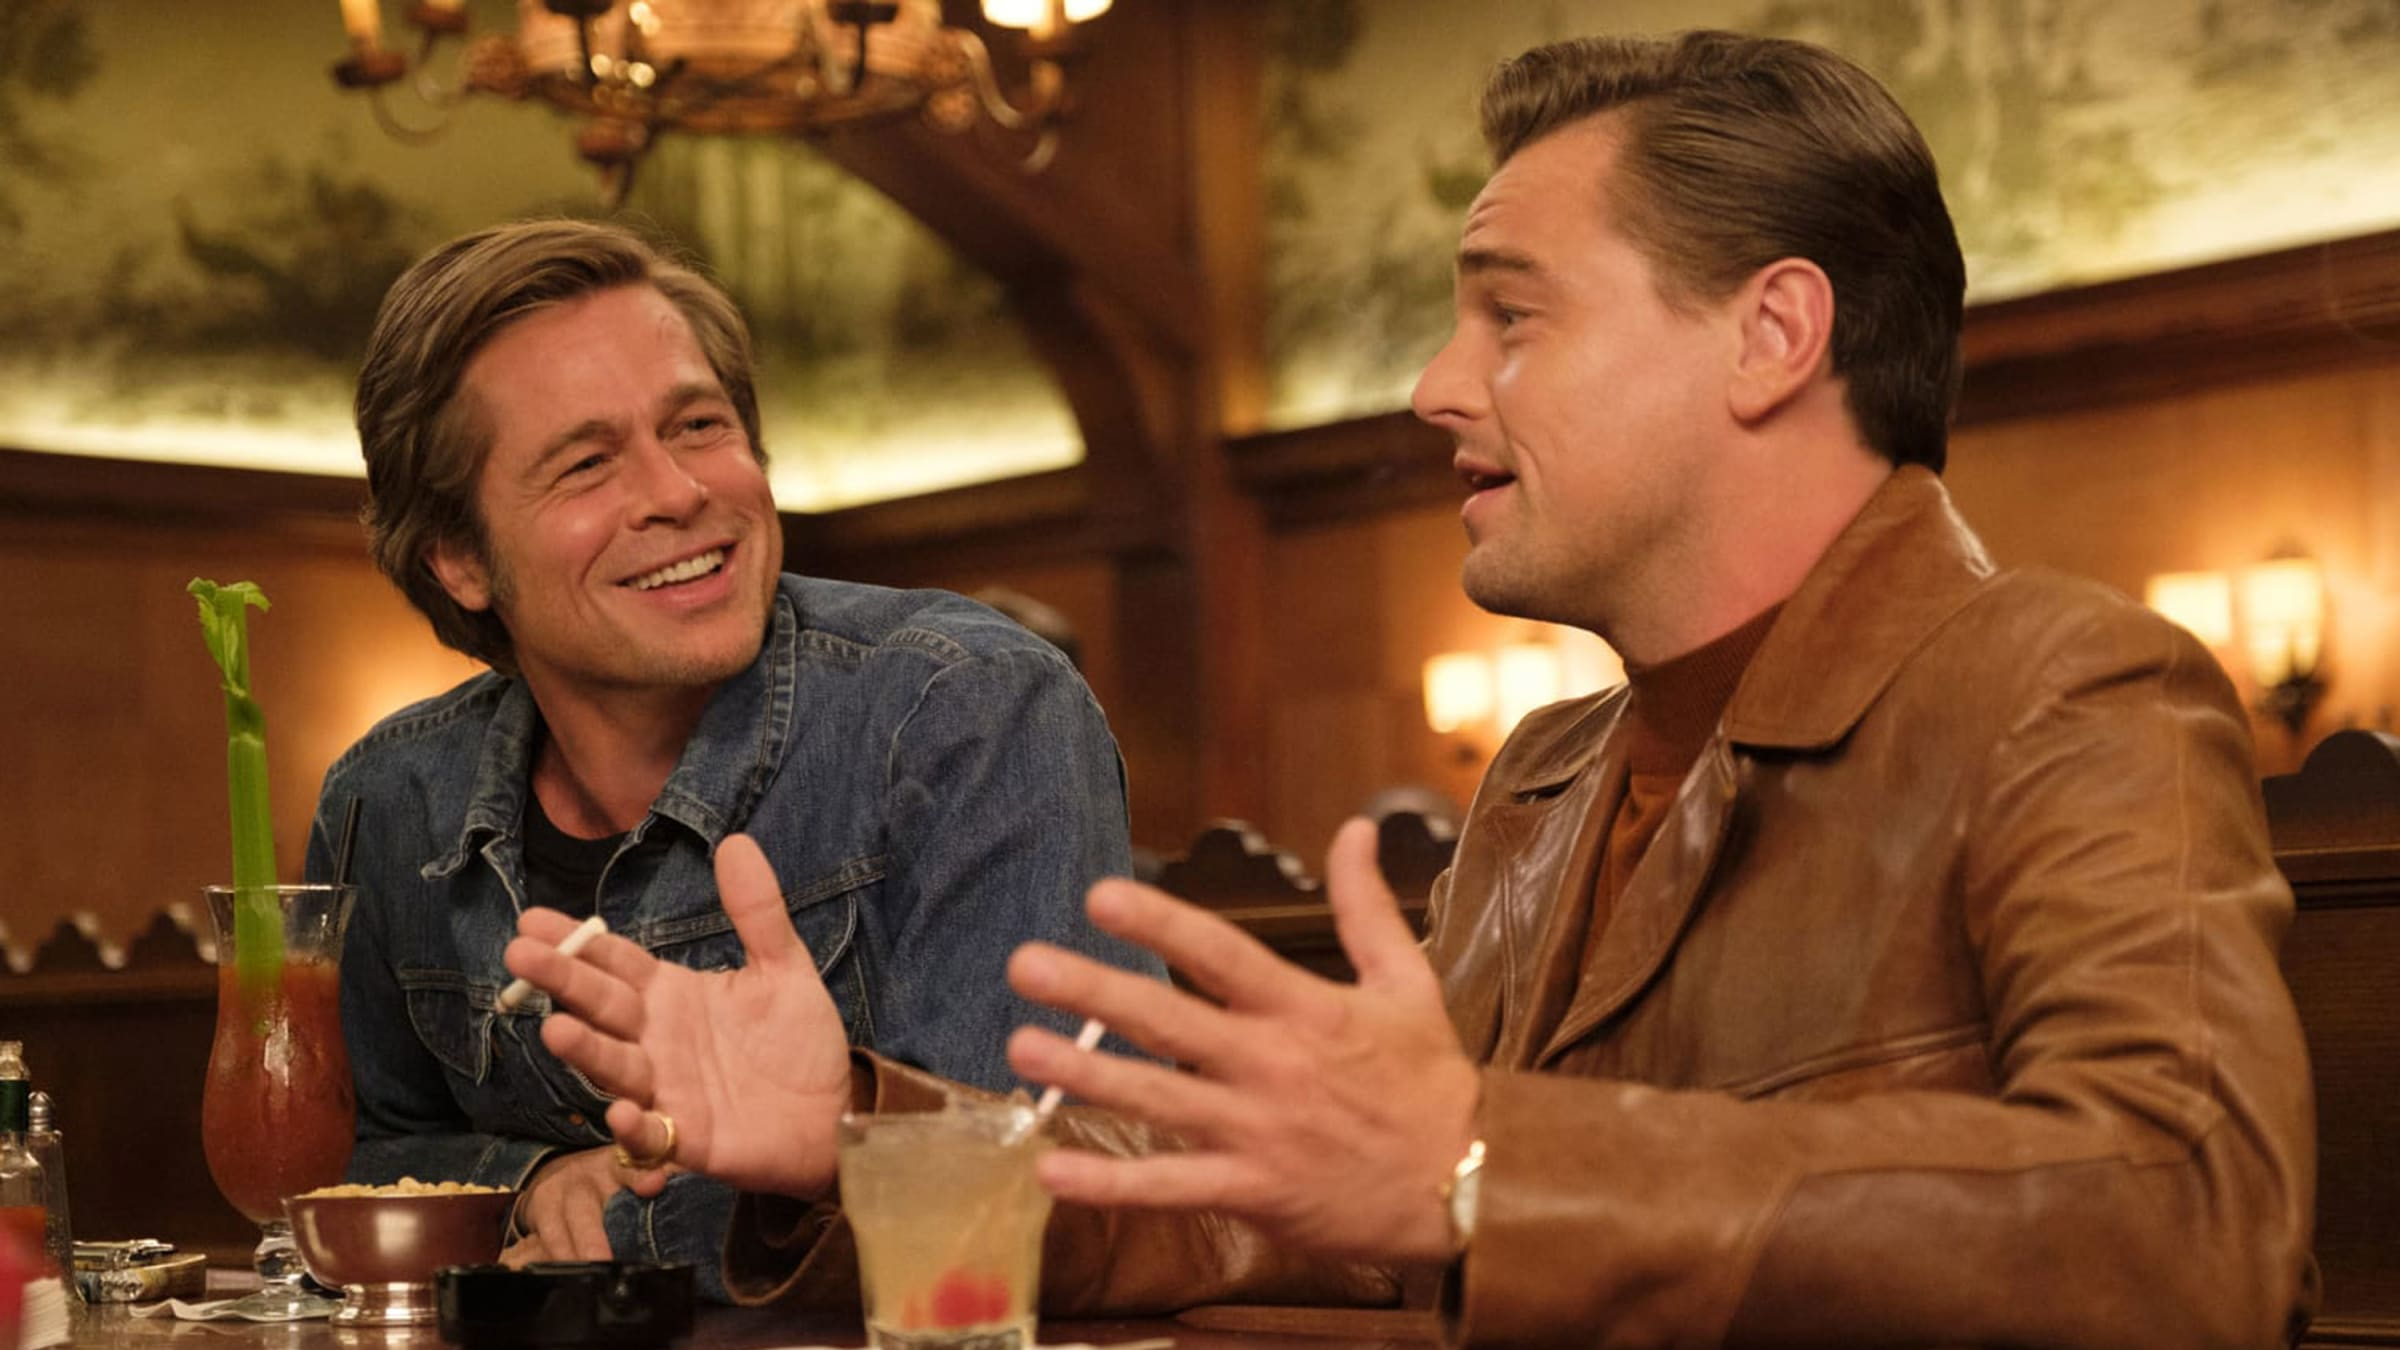 Drinking & Partying like Brad Pitt and Leonardo DiCaprio